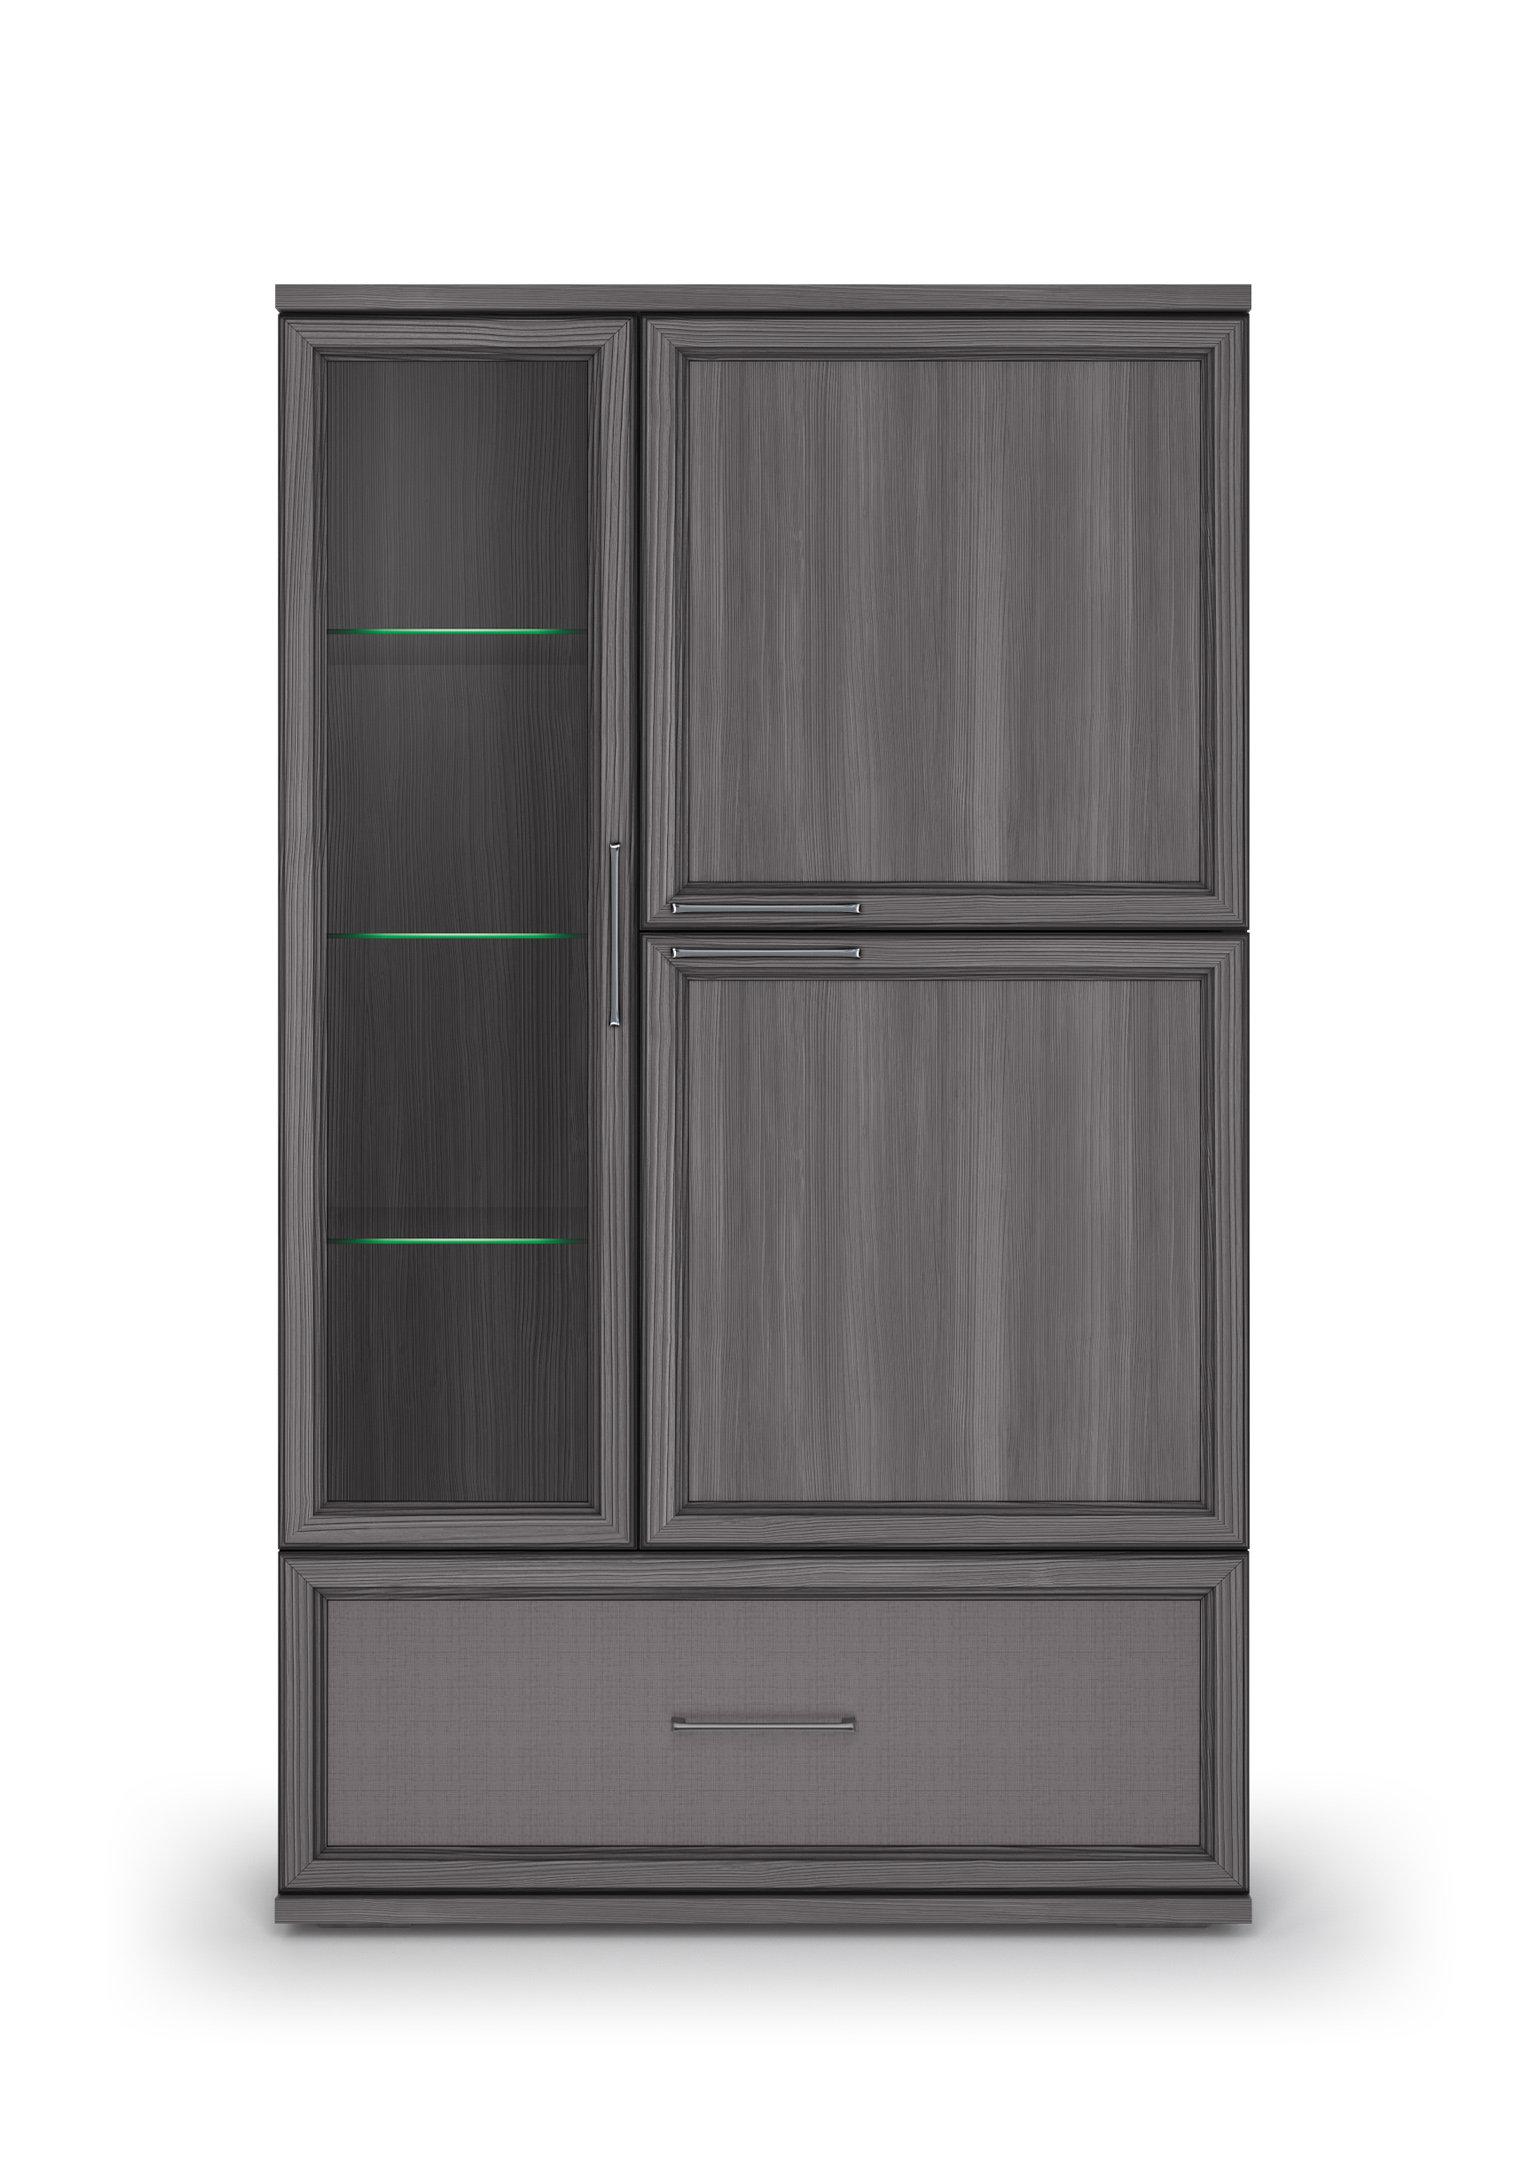 Шкаф 950 с 1 ящиком «Палермо» Кураж